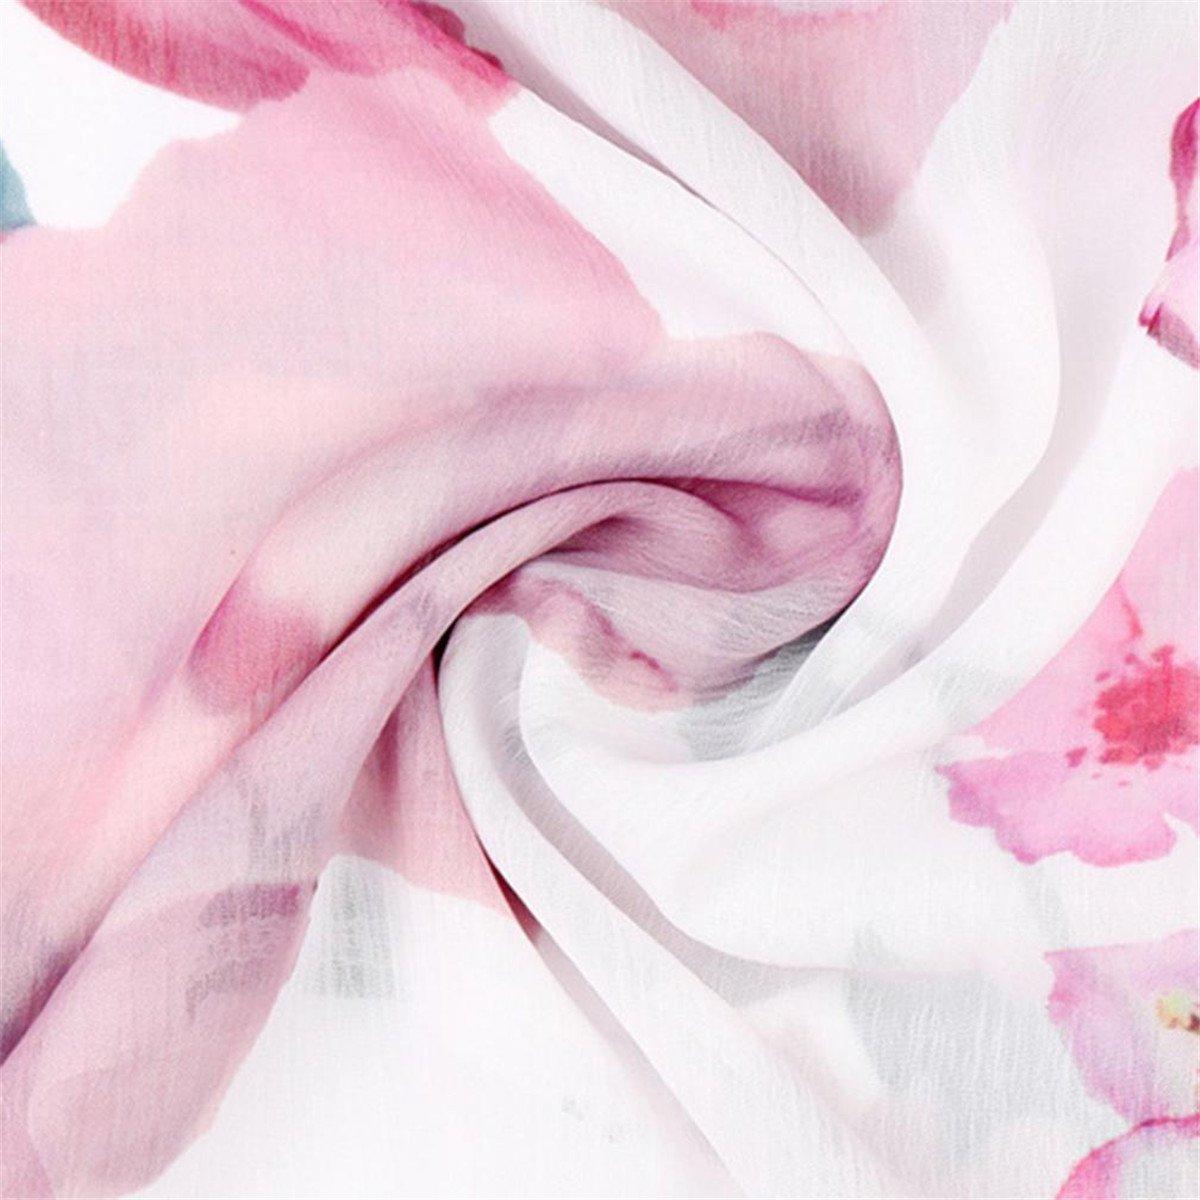 HongXander Plus Size Women Casual Floral Printed Beach Blouse Button T-Shirt Chiffon Irregular Hem Top by HongXander-Shirts (Image #6)